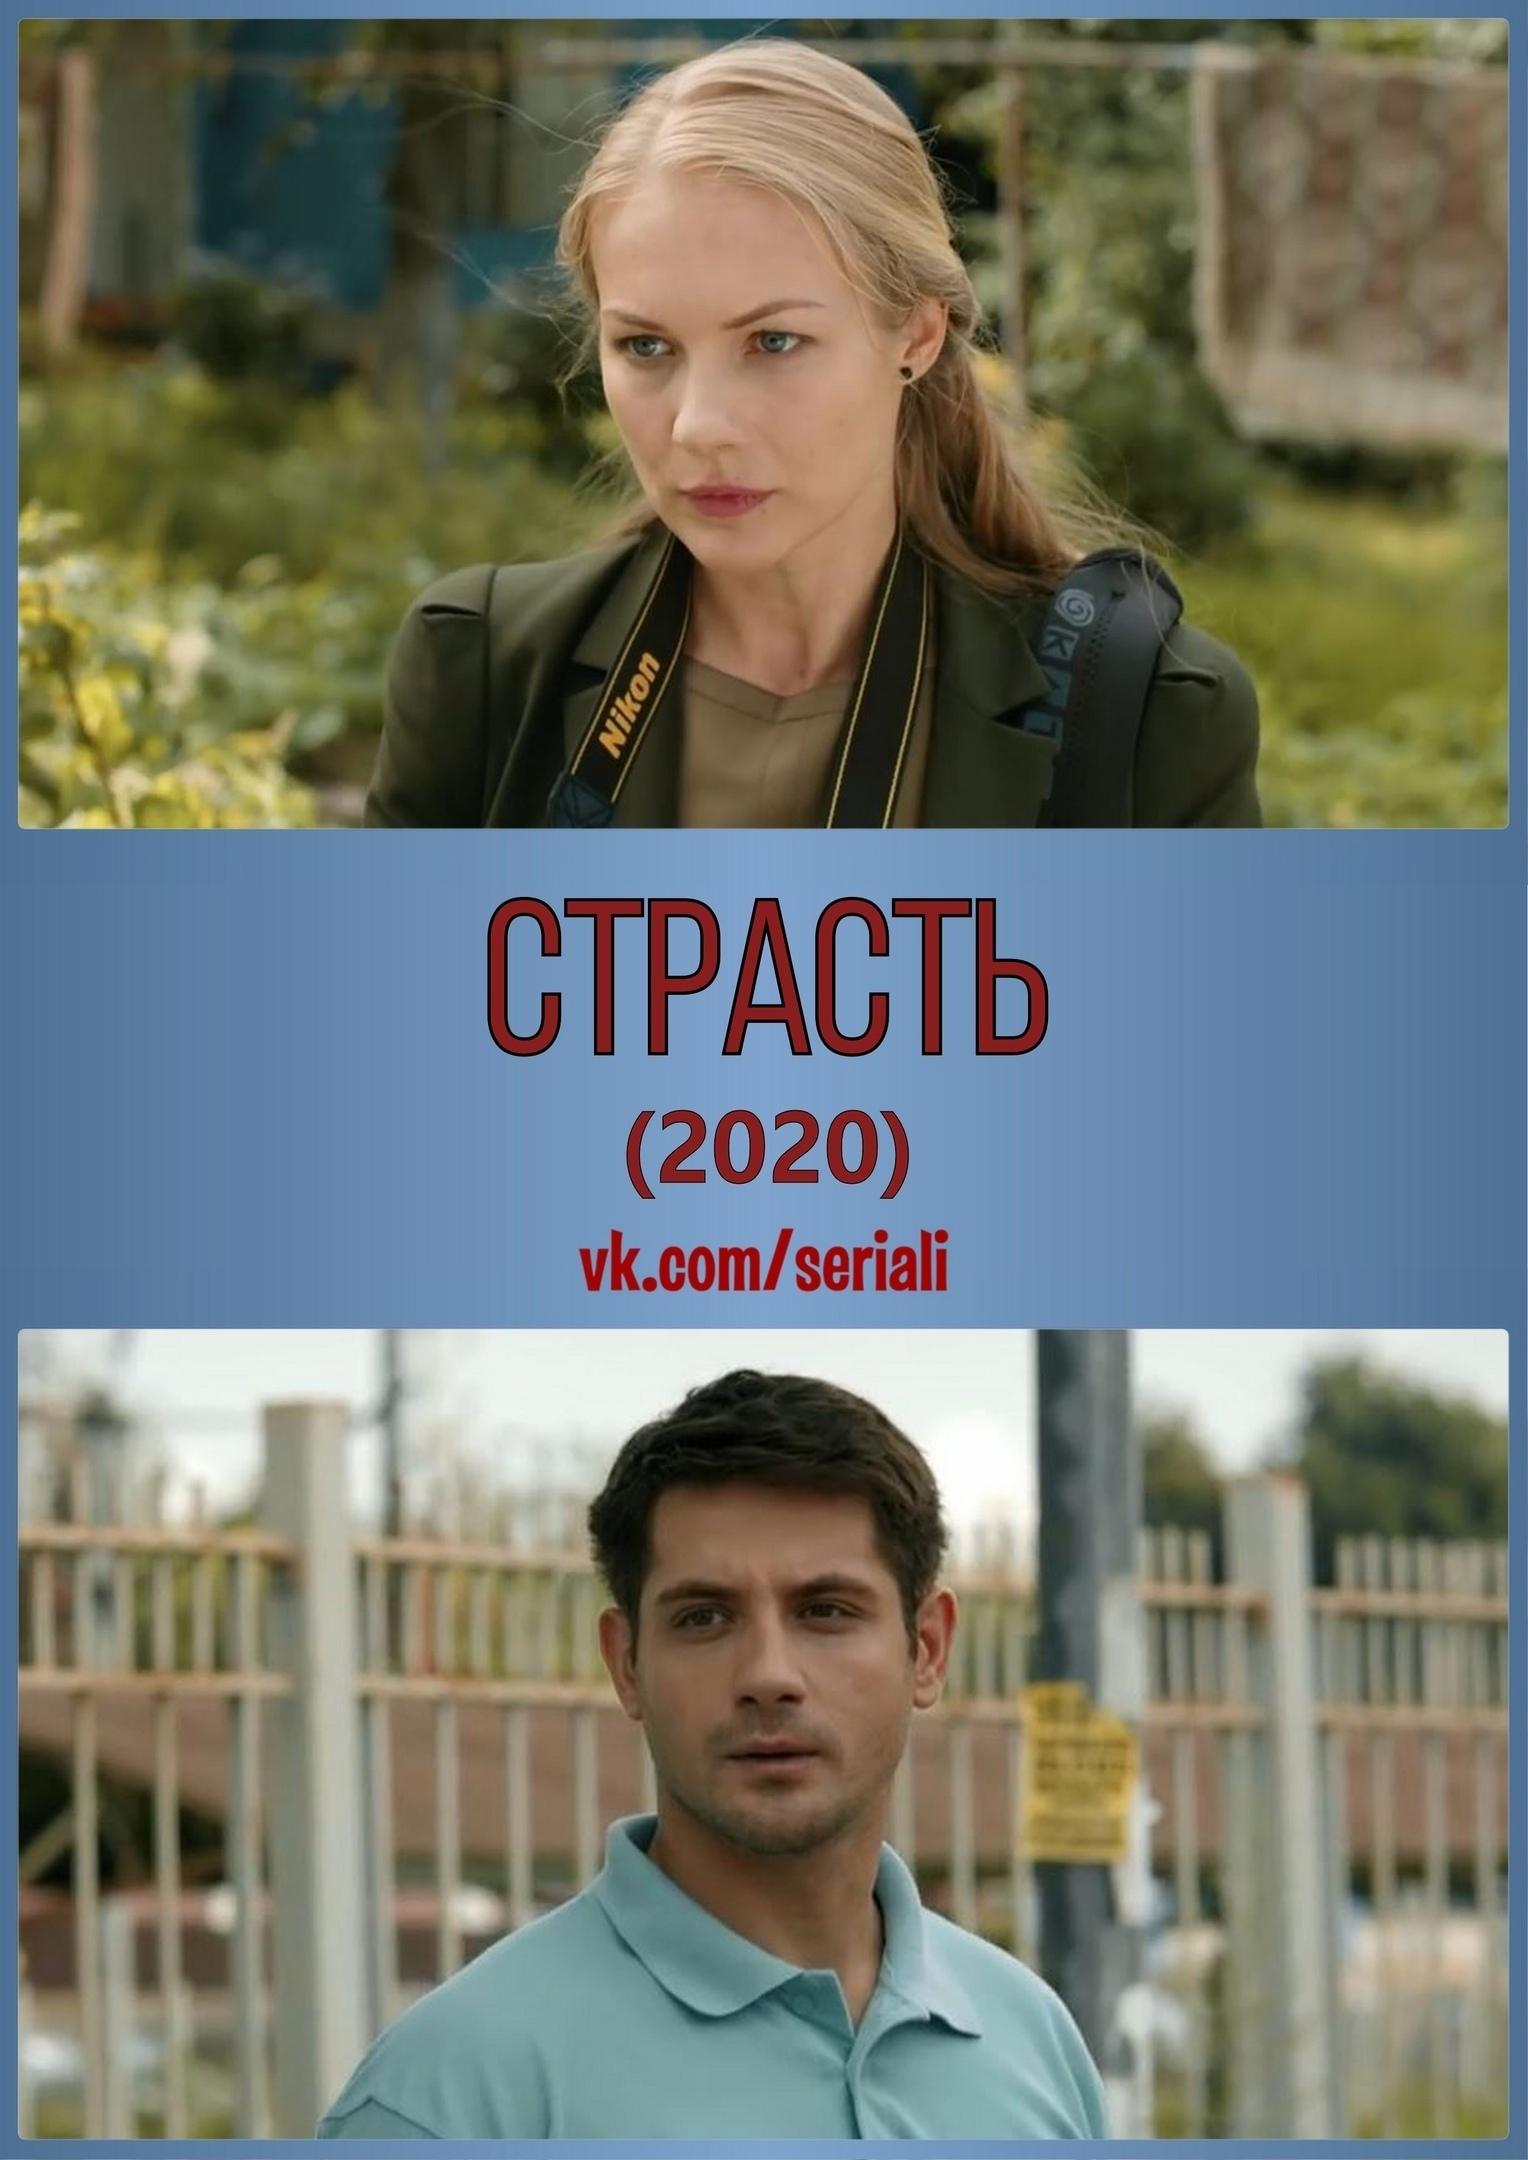 Мелодрама «Cтpacть» (2020) 1-8 серия из 8 HD